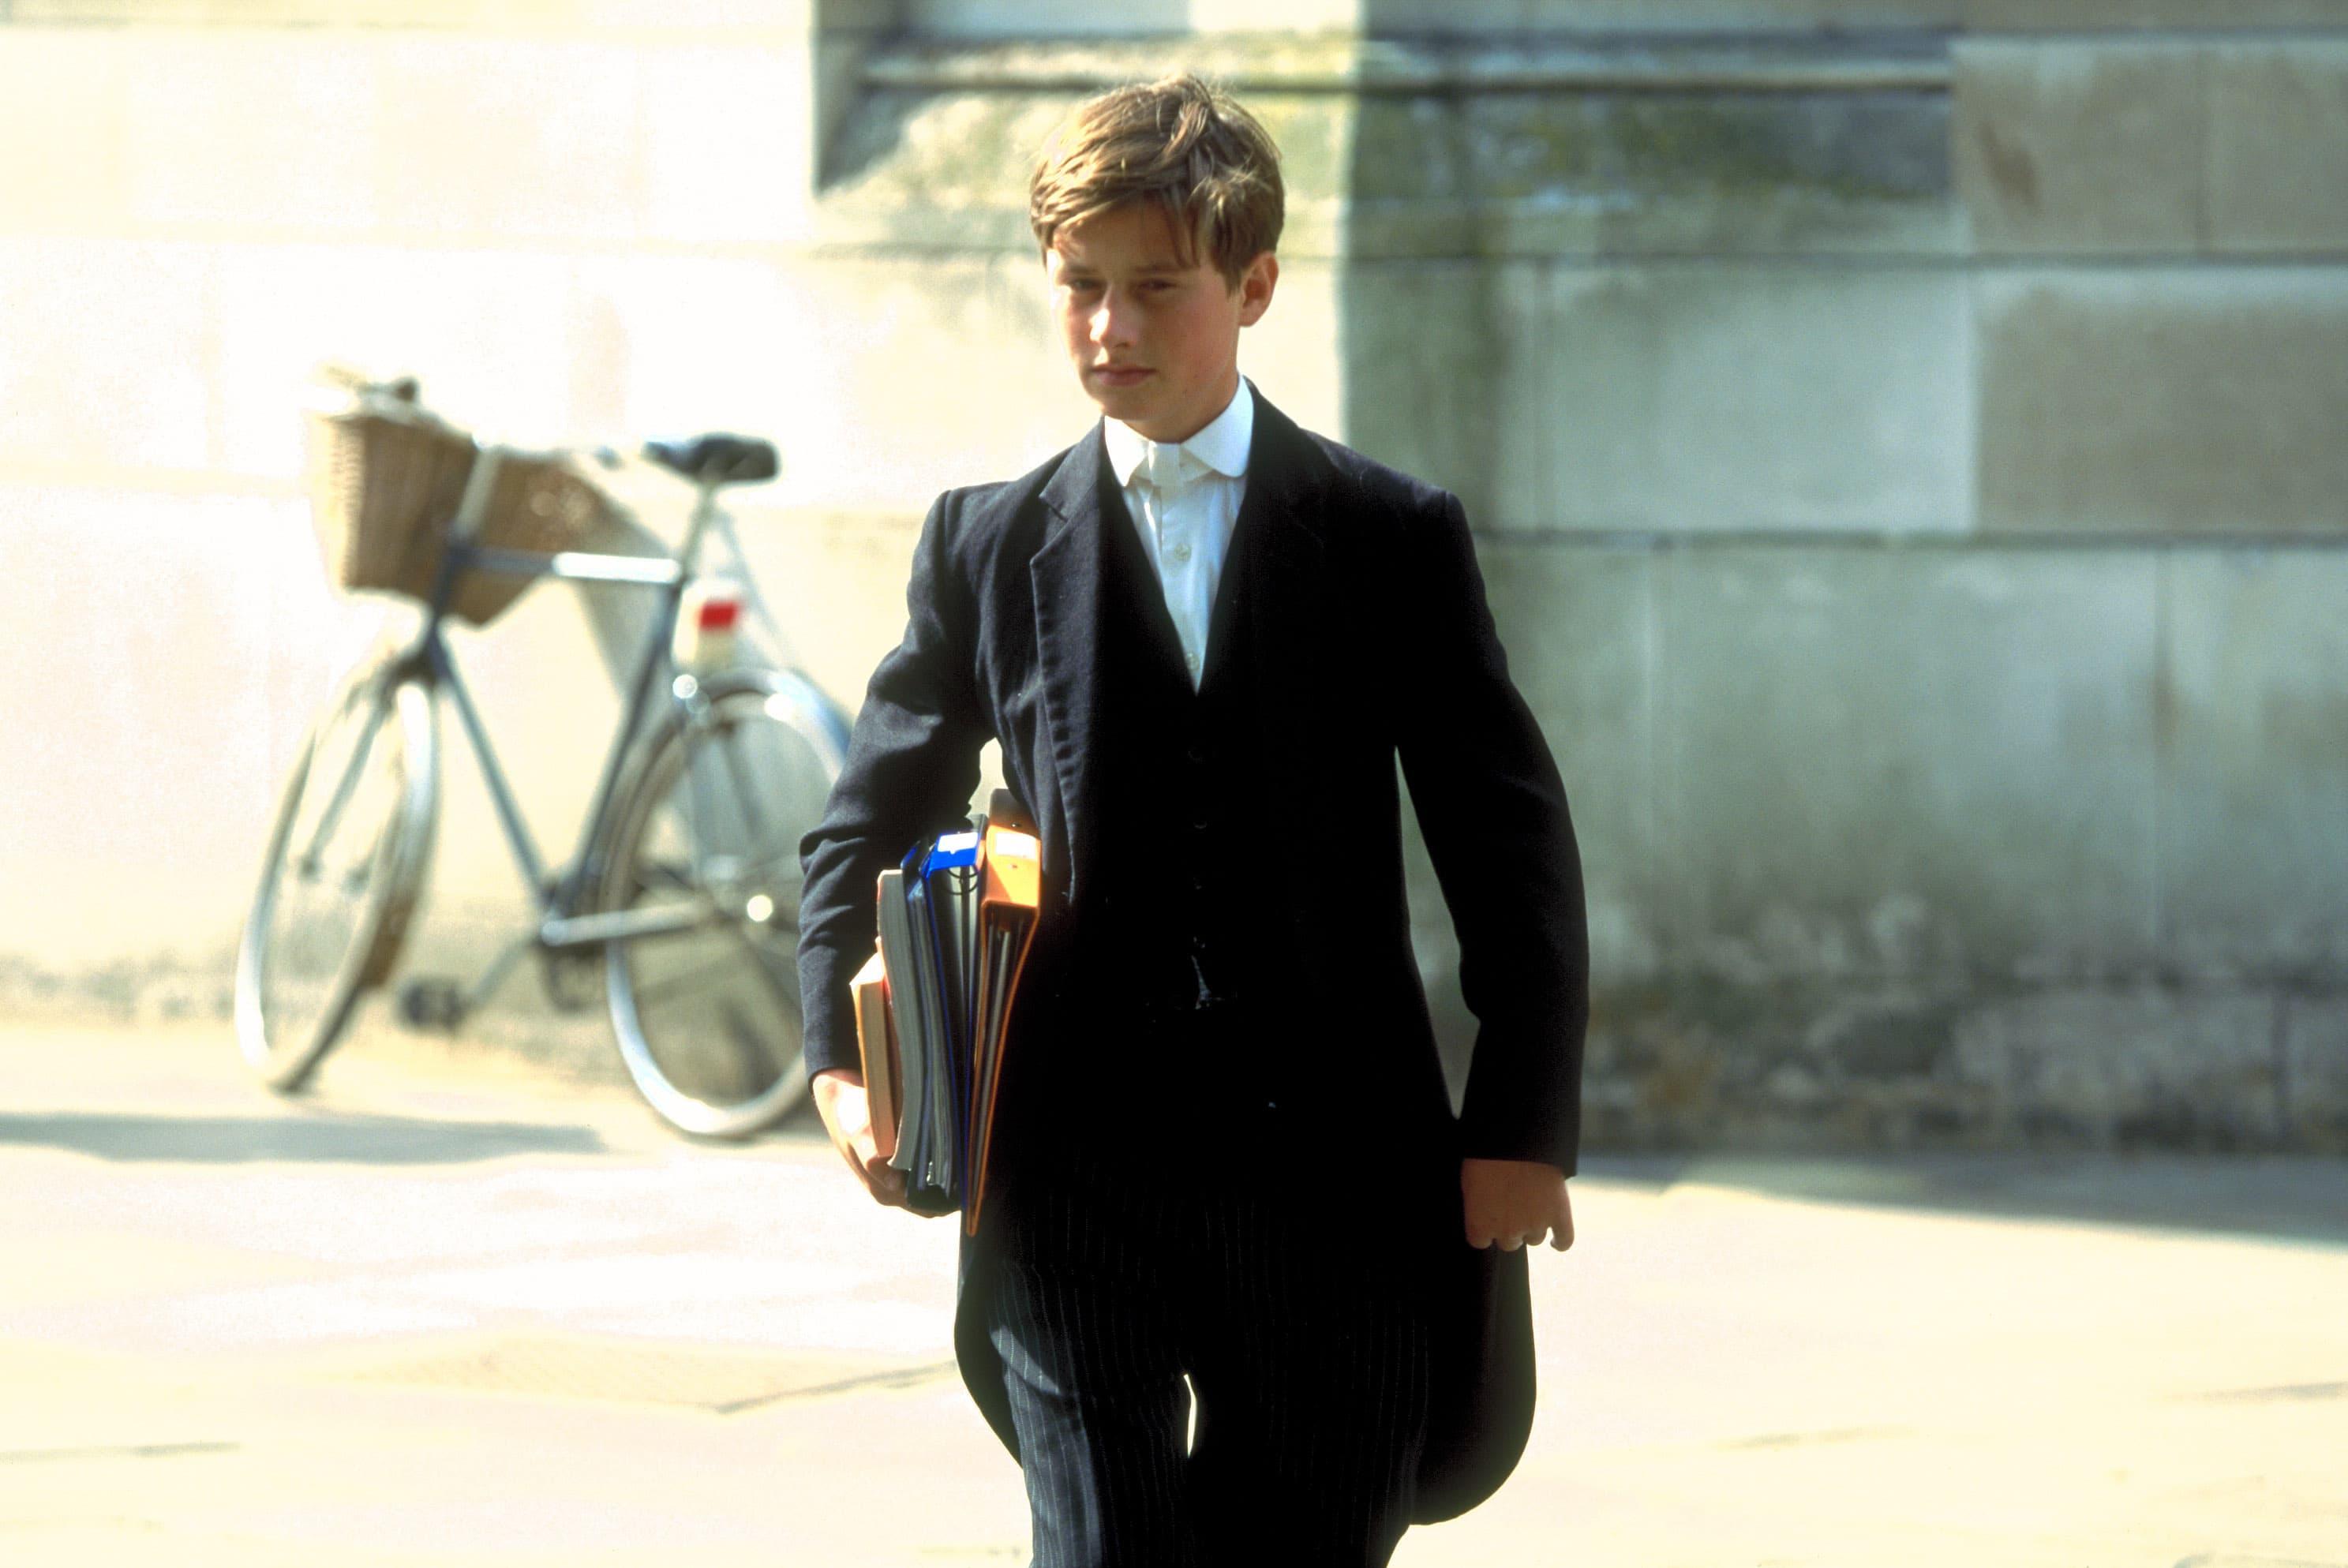 Schoolboy at Eton